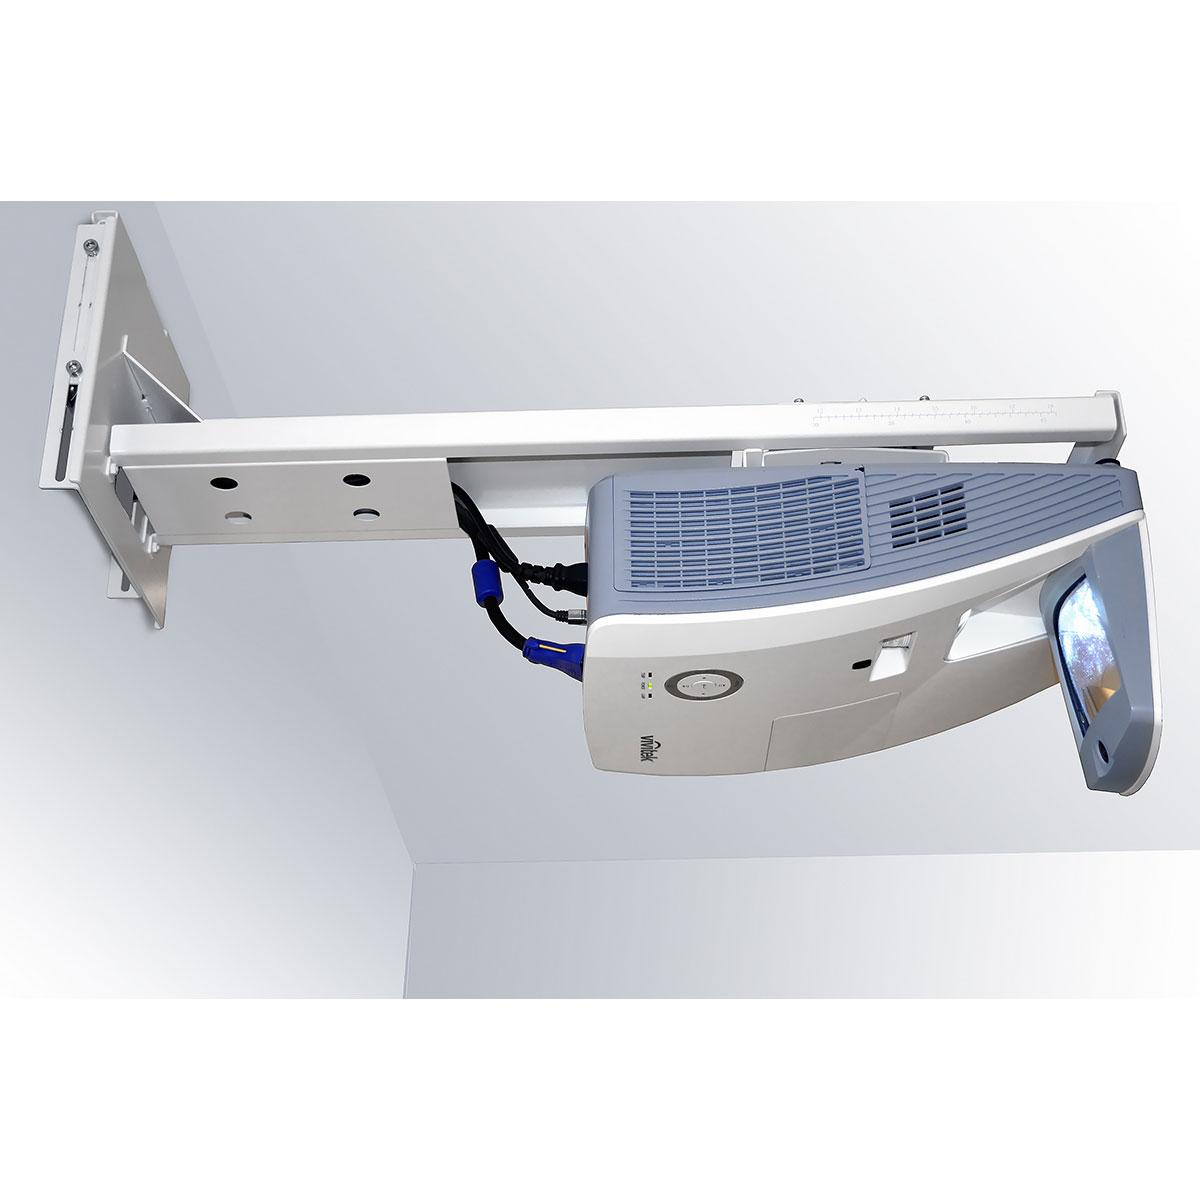 vivitek wmb x1 support plafond vid oprojecteur vivitek sur ldlc. Black Bedroom Furniture Sets. Home Design Ideas